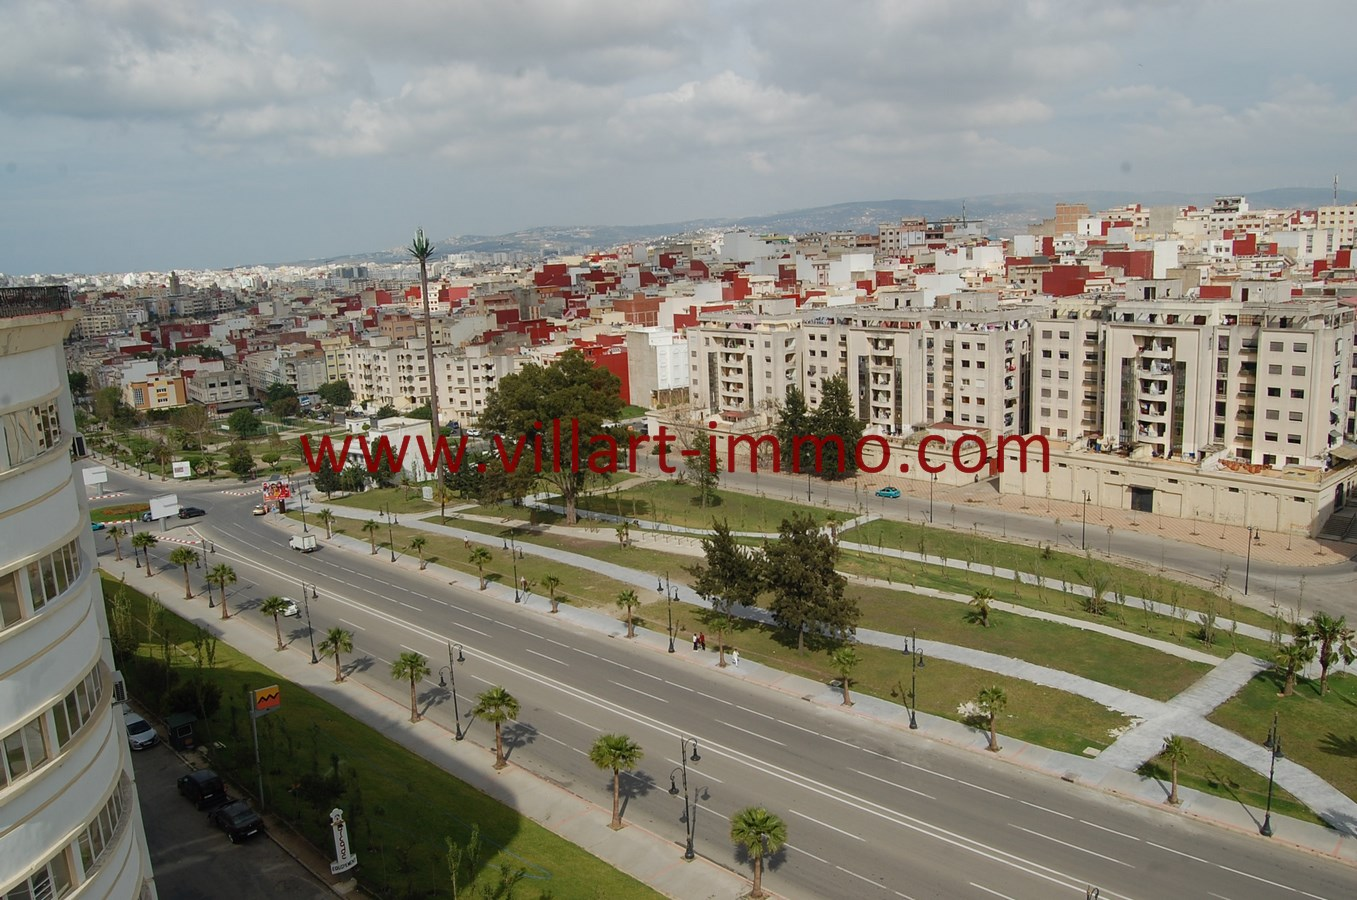 1 Vente Appartement Tanger Route de Rabat Vue VA494 Villart Immo